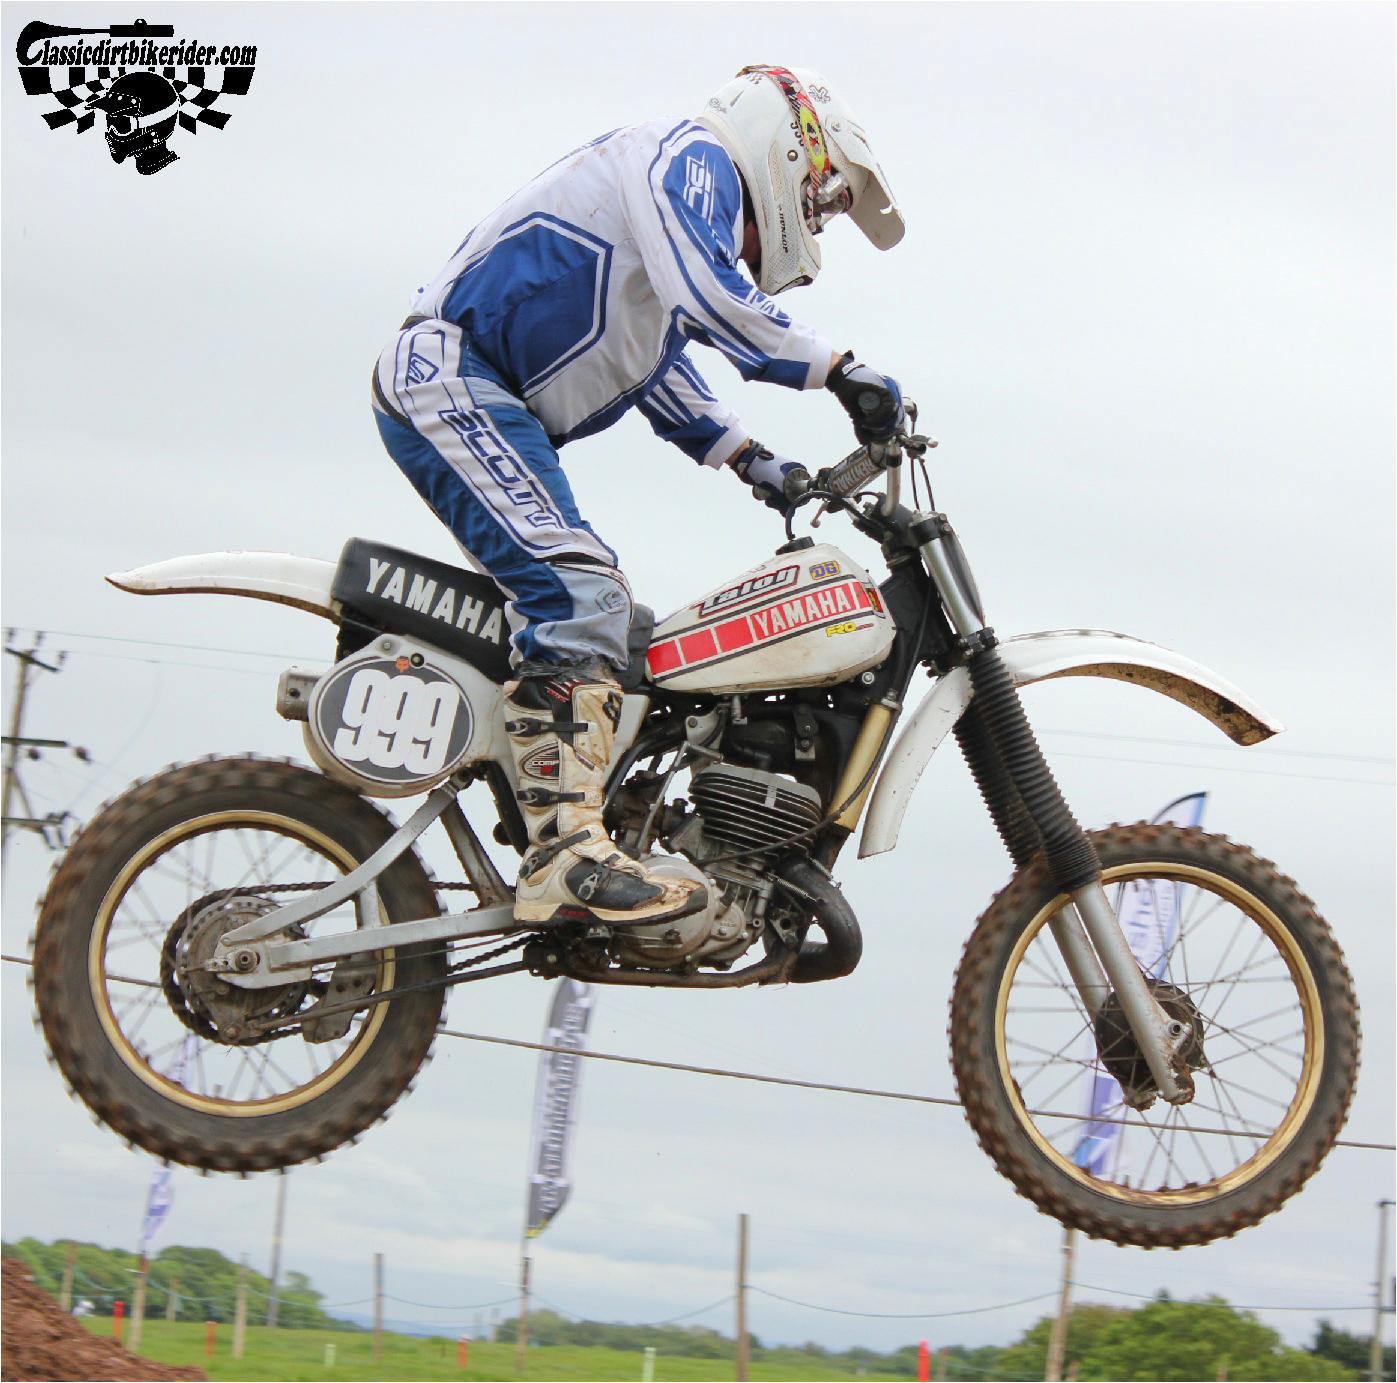 classicdirtbikerider.com-national-twinshock-championship-2015-Garstang-grabbing some air CLASSIC Yamaha YZ250